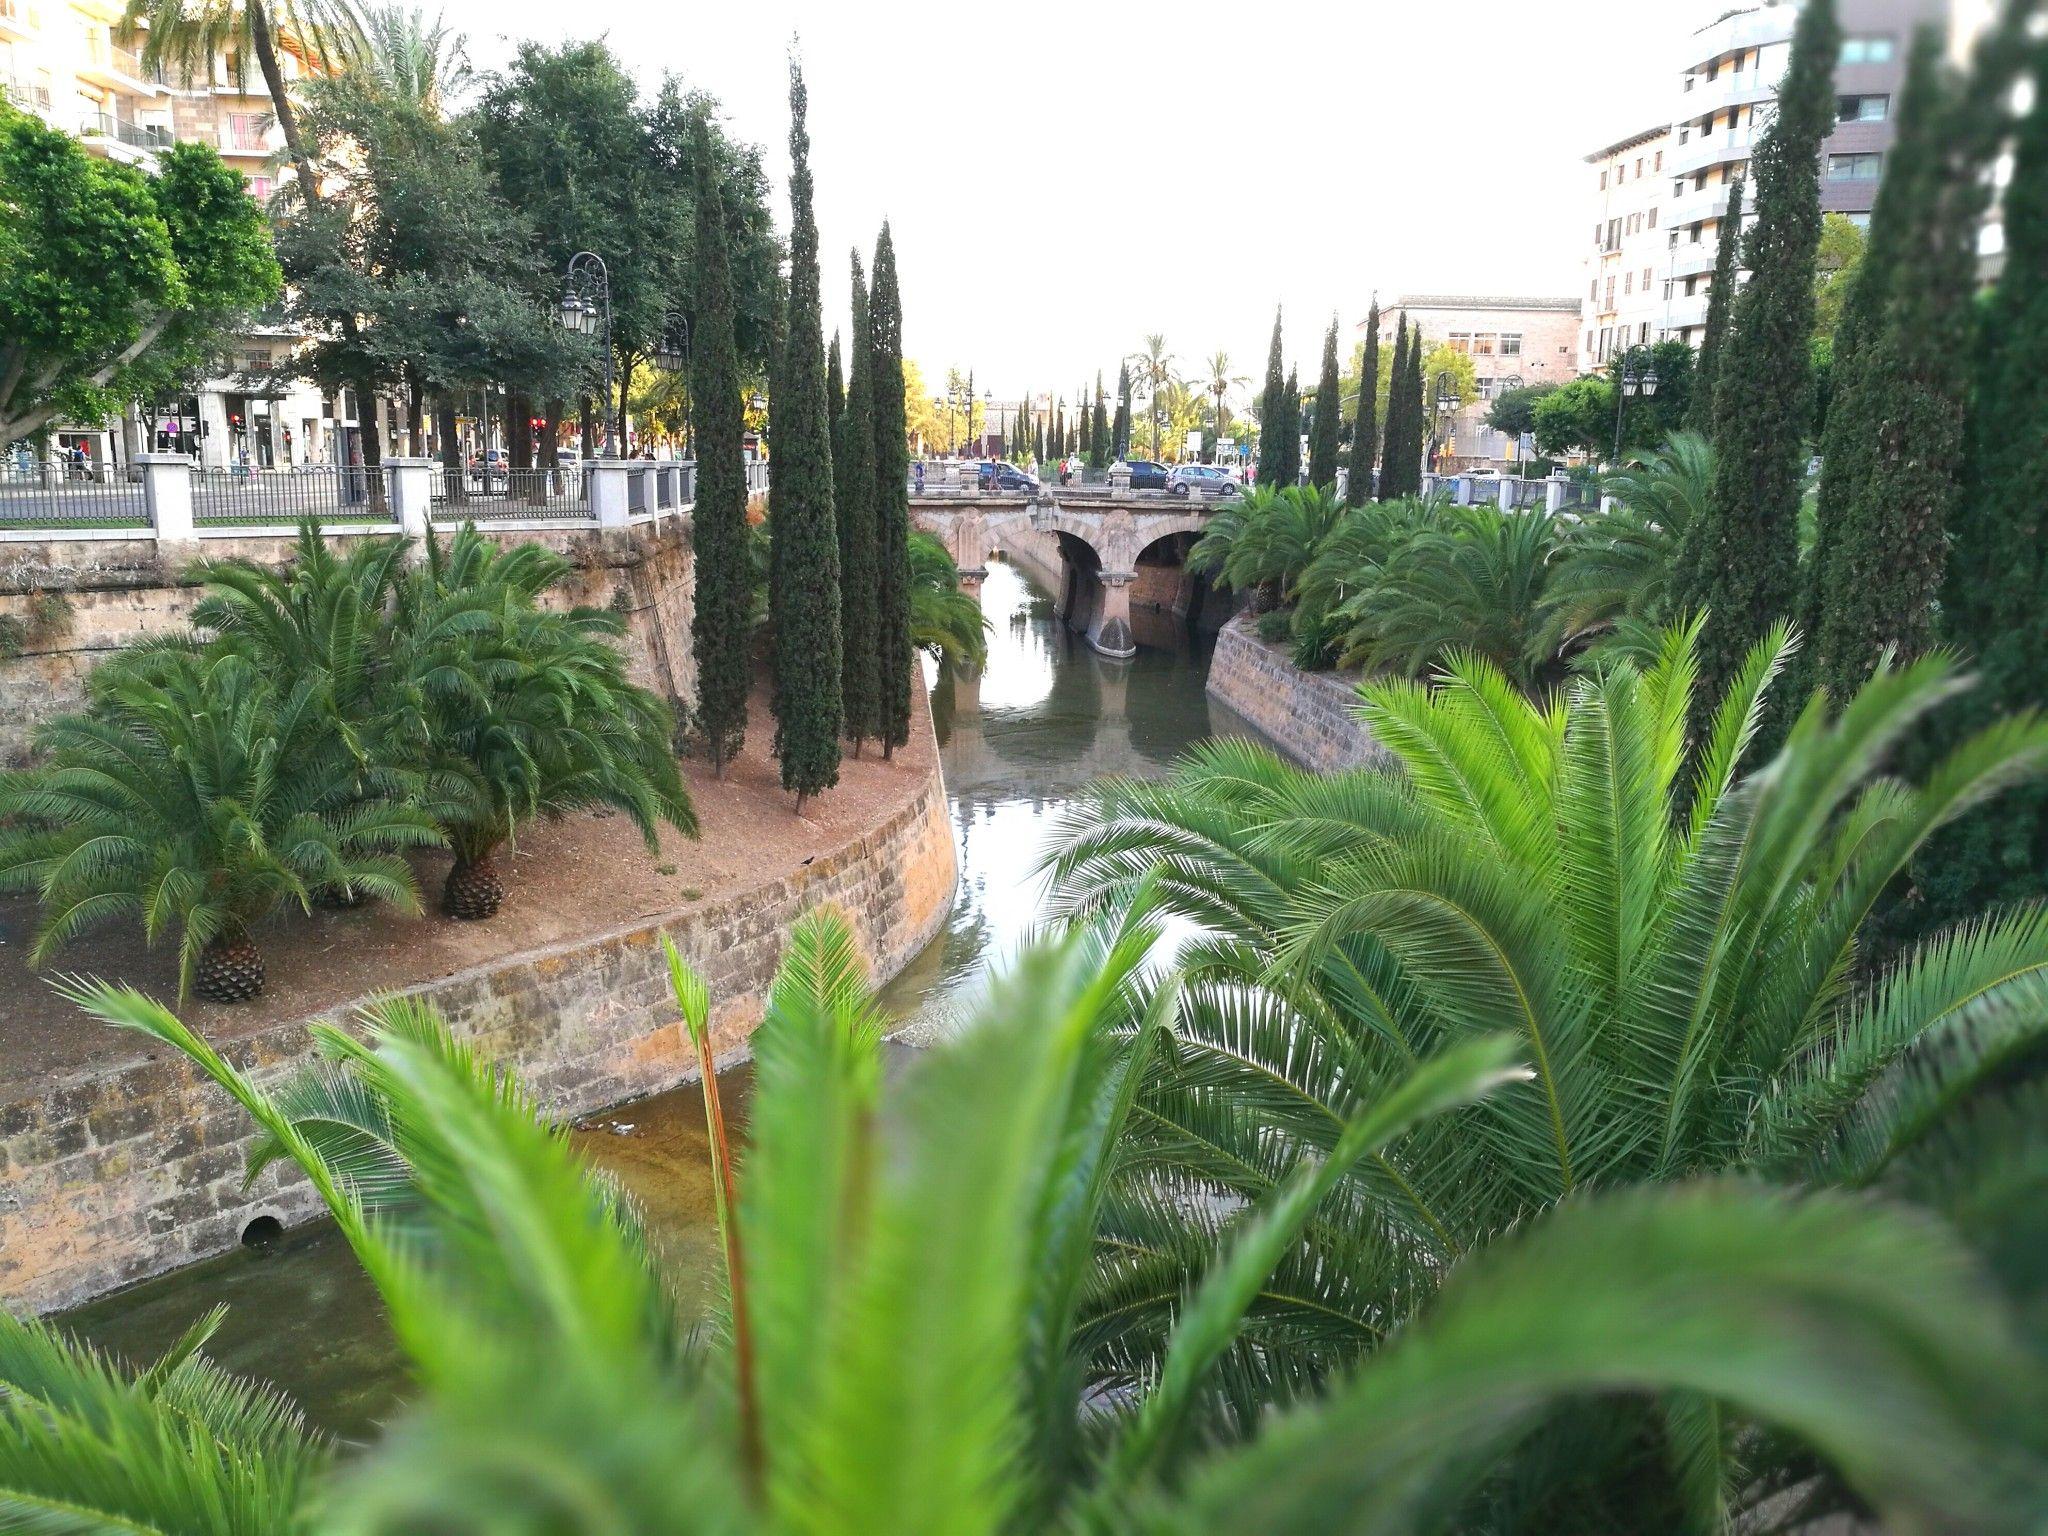 Mallorca, Palma, hotspots